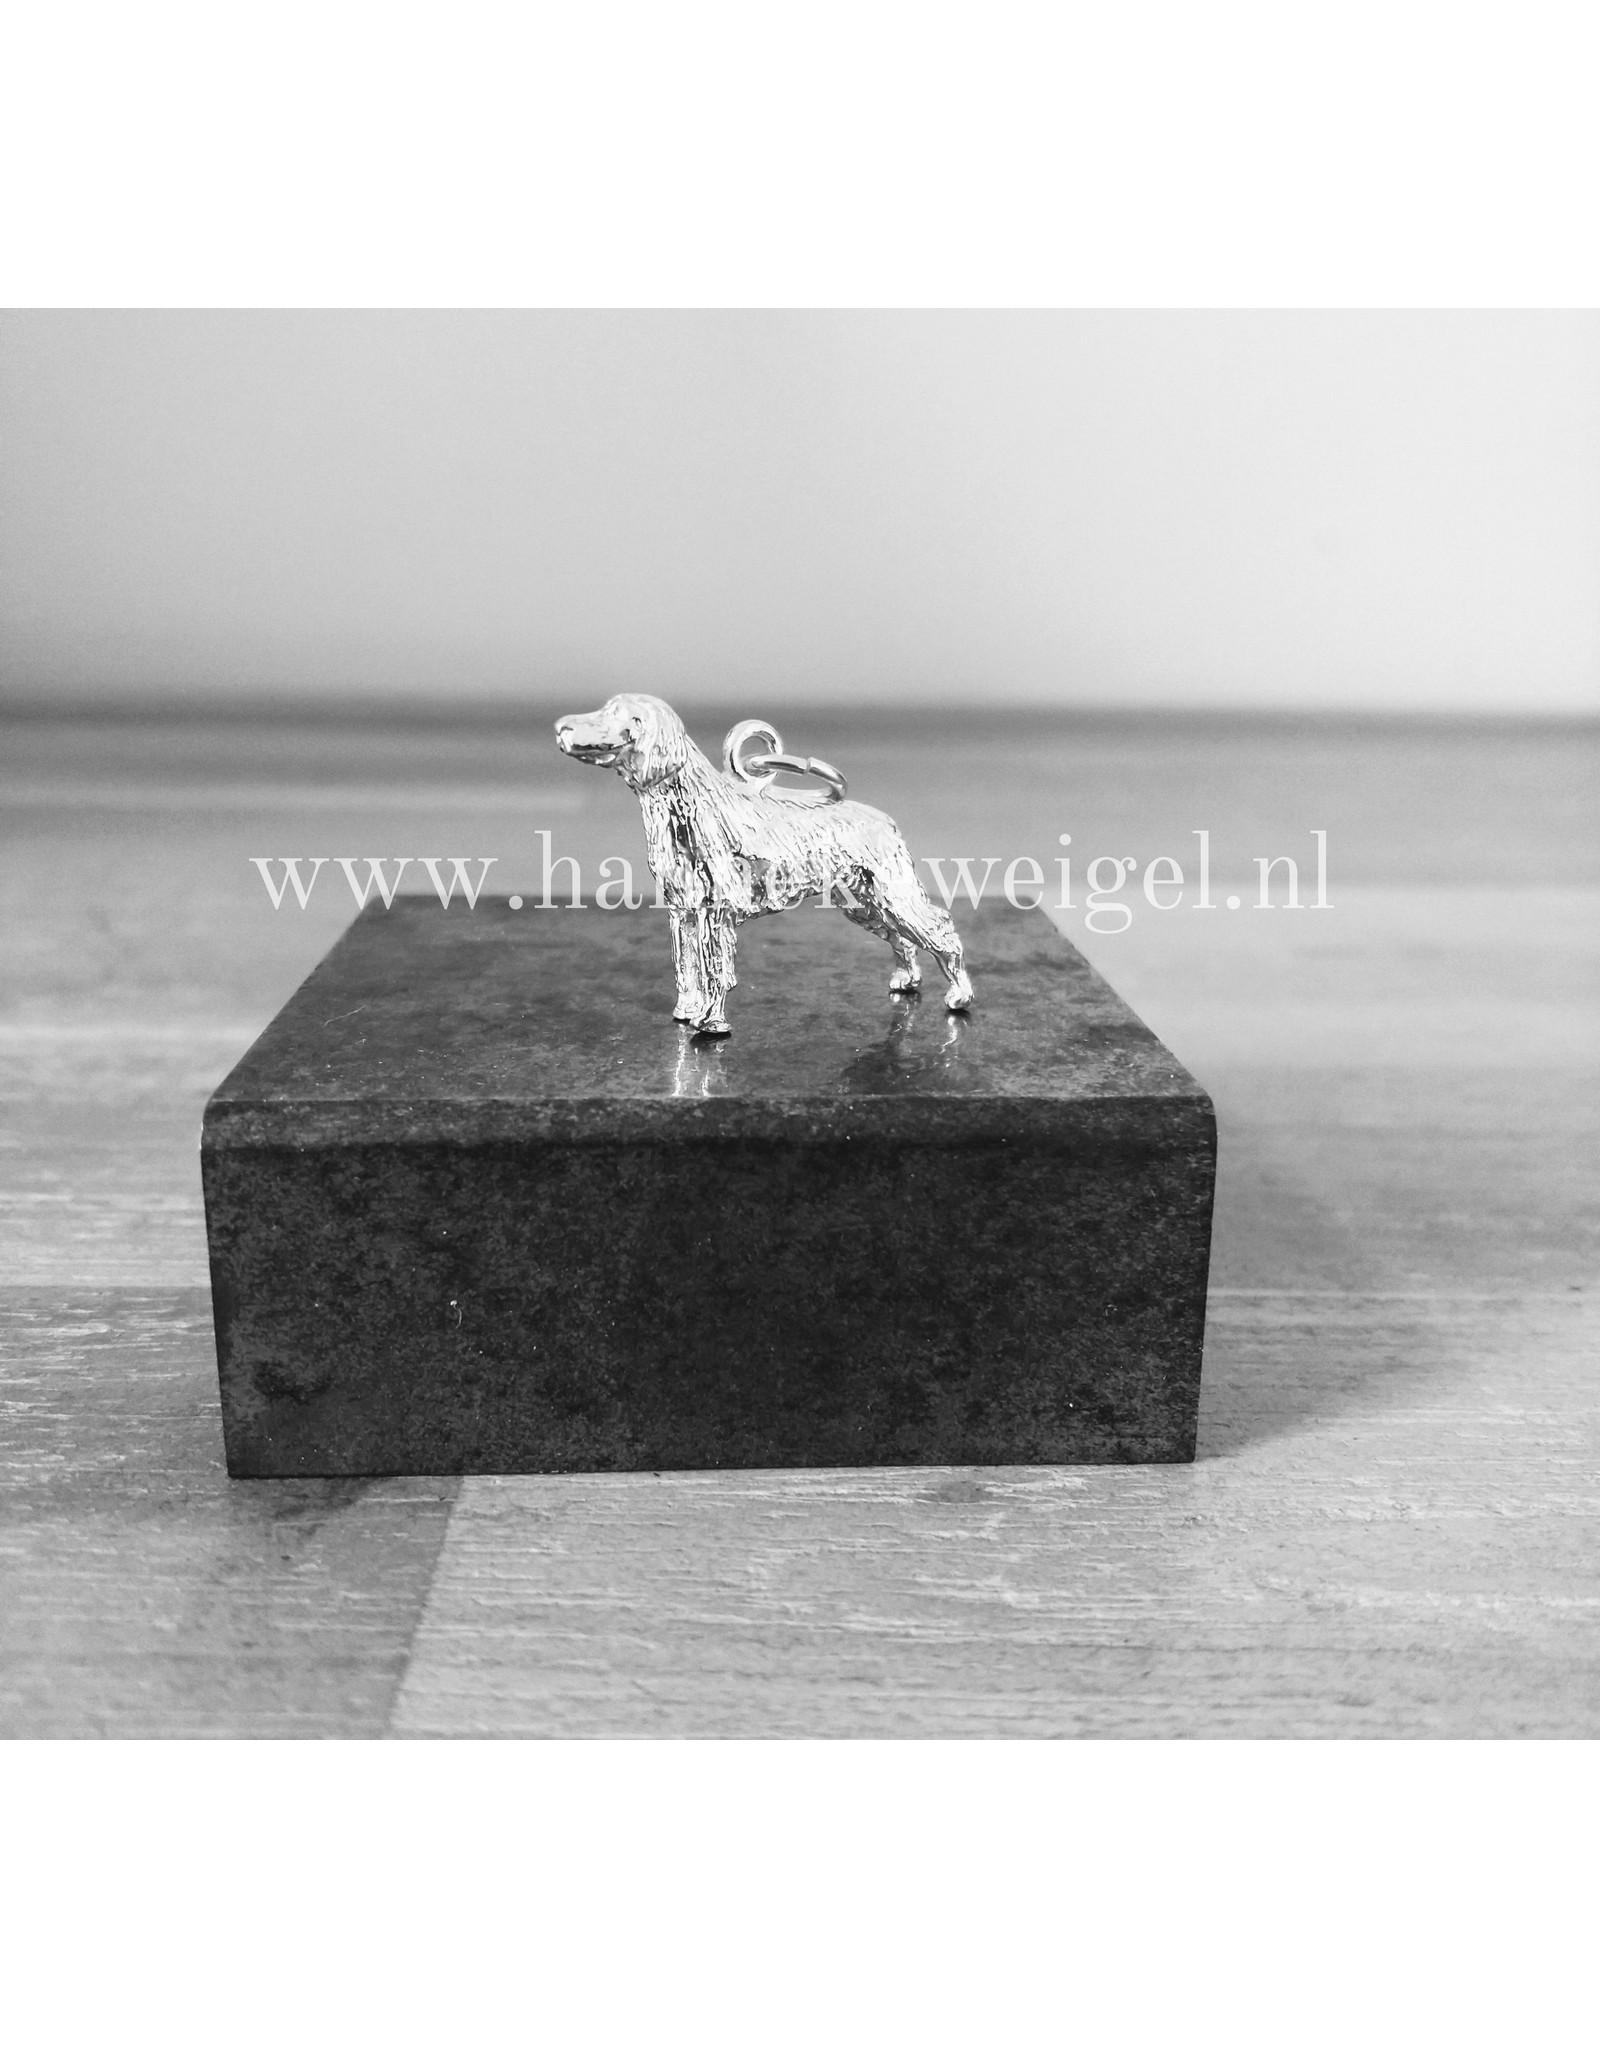 Handmade by Hanneke Weigel Zilveren Duitse staande langhaar